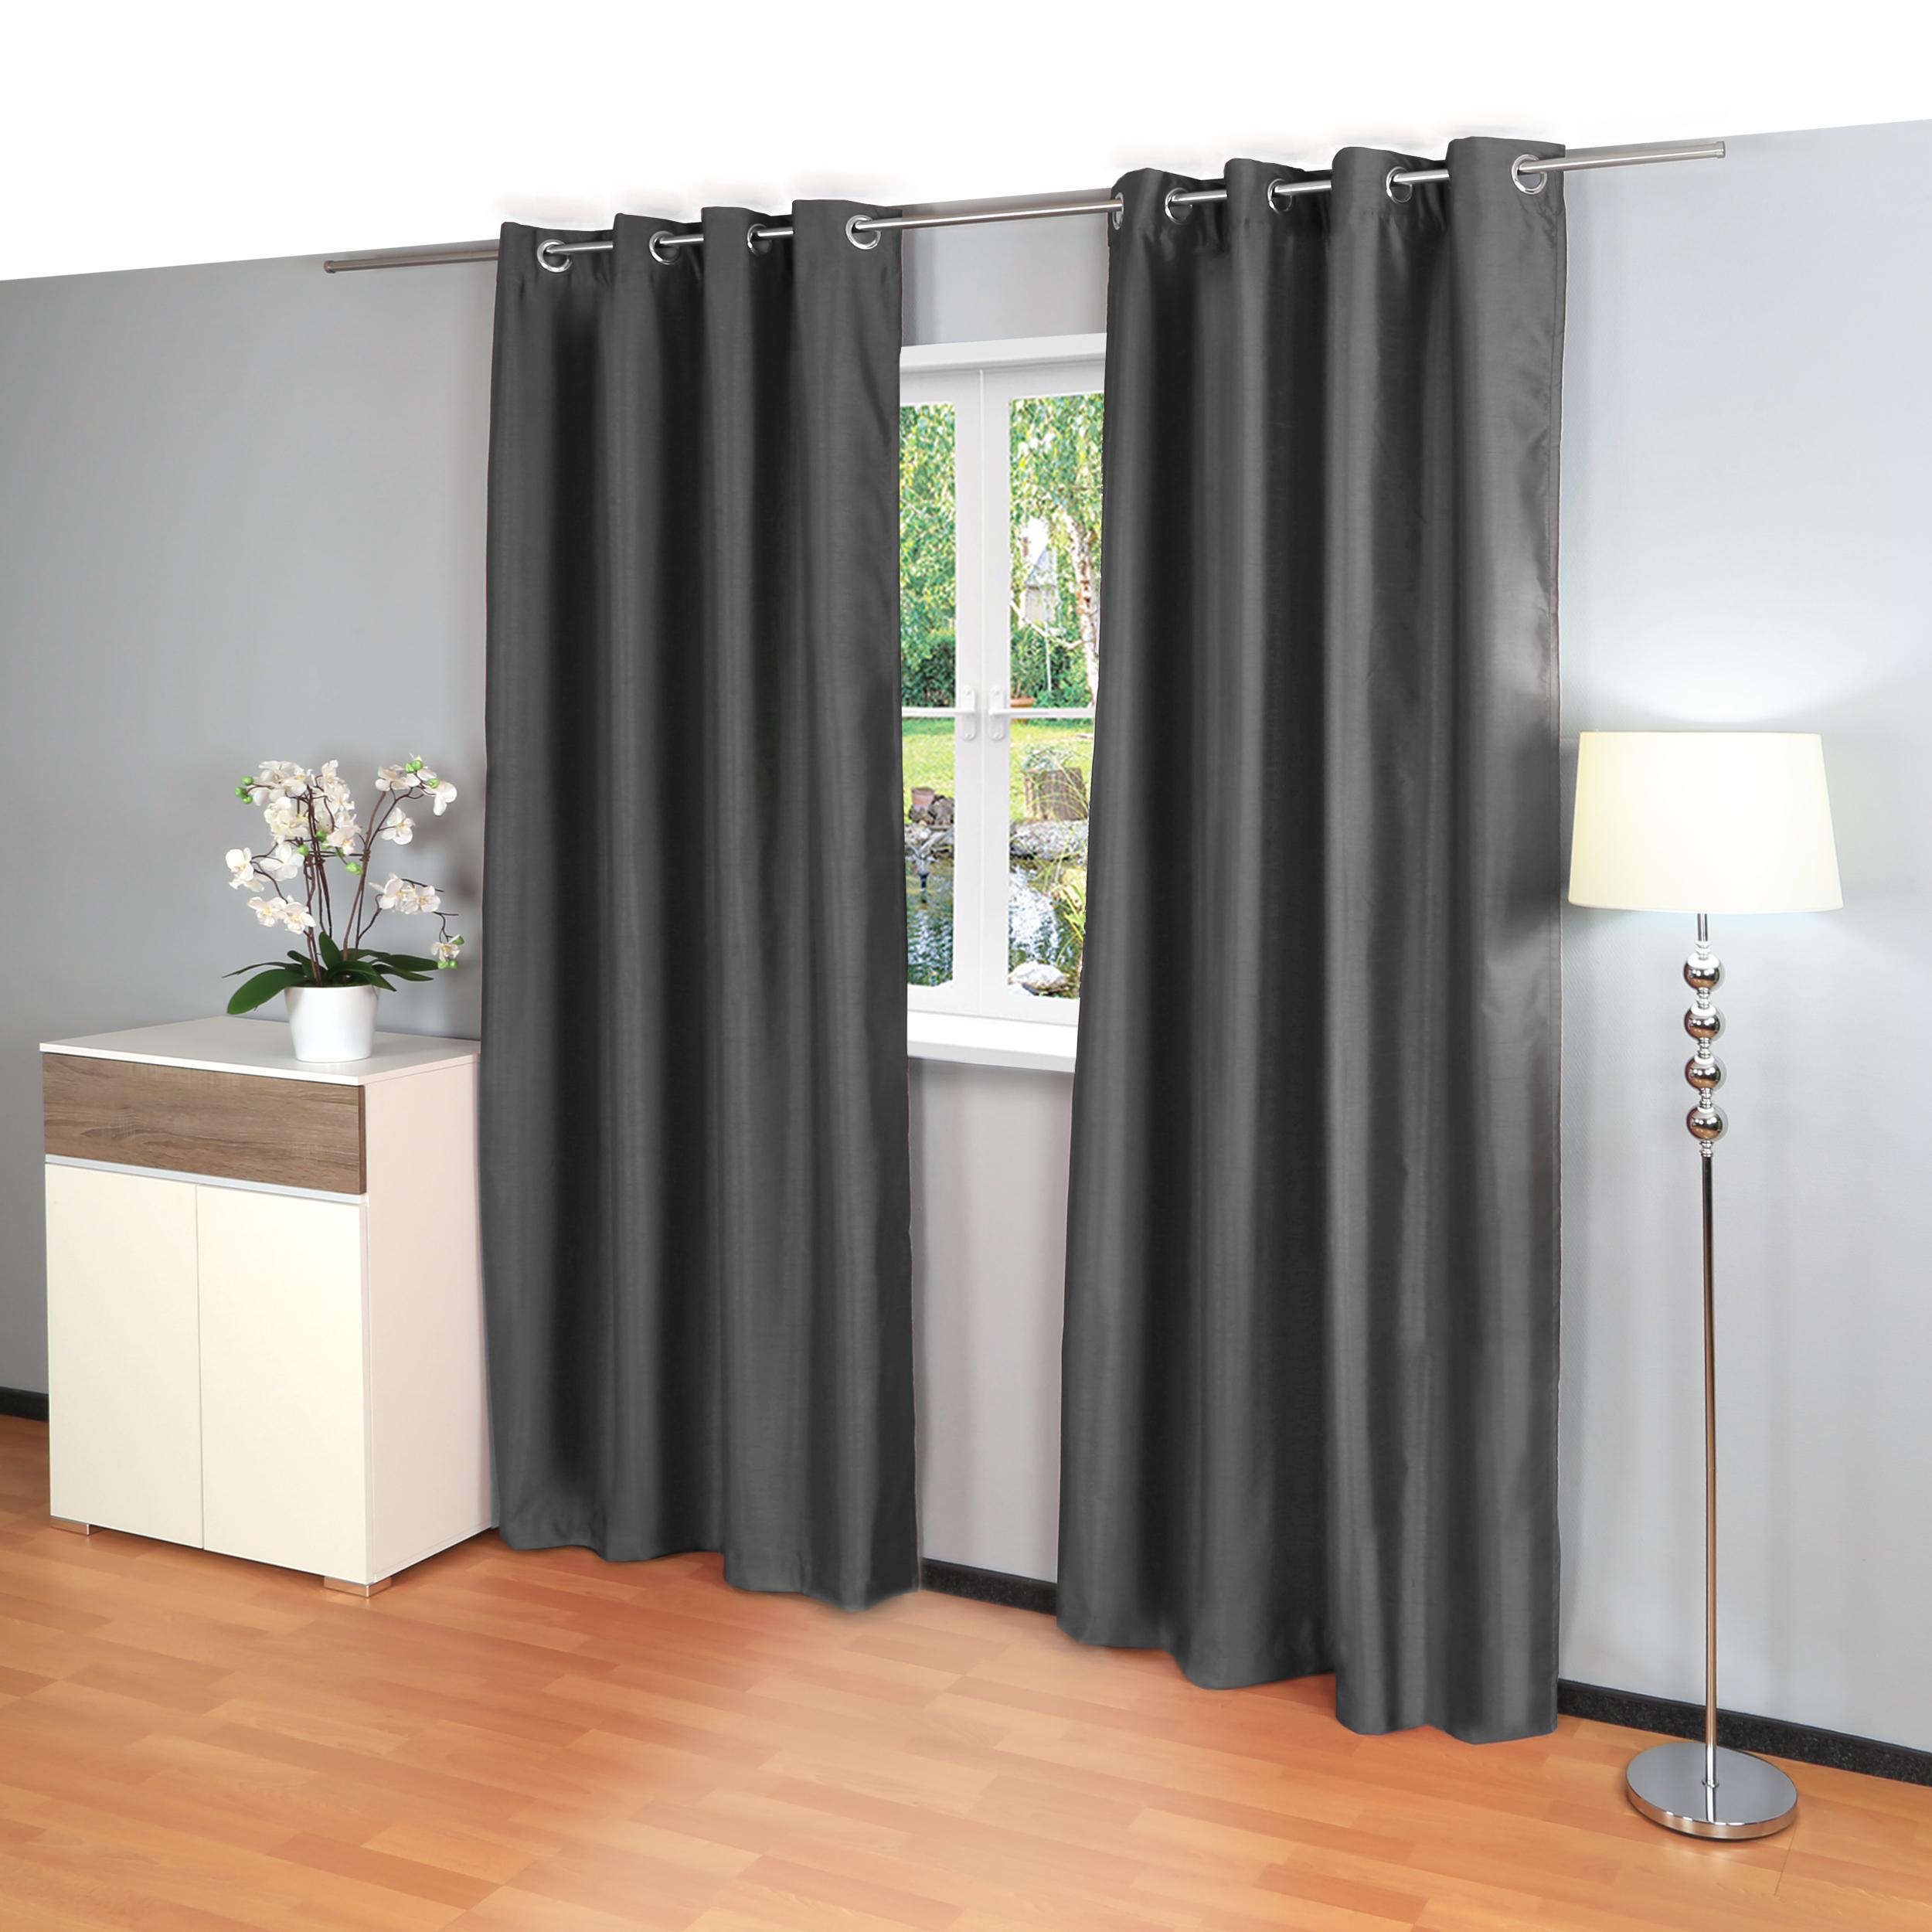 blickdichte vorh nge mit sen m belideen. Black Bedroom Furniture Sets. Home Design Ideas